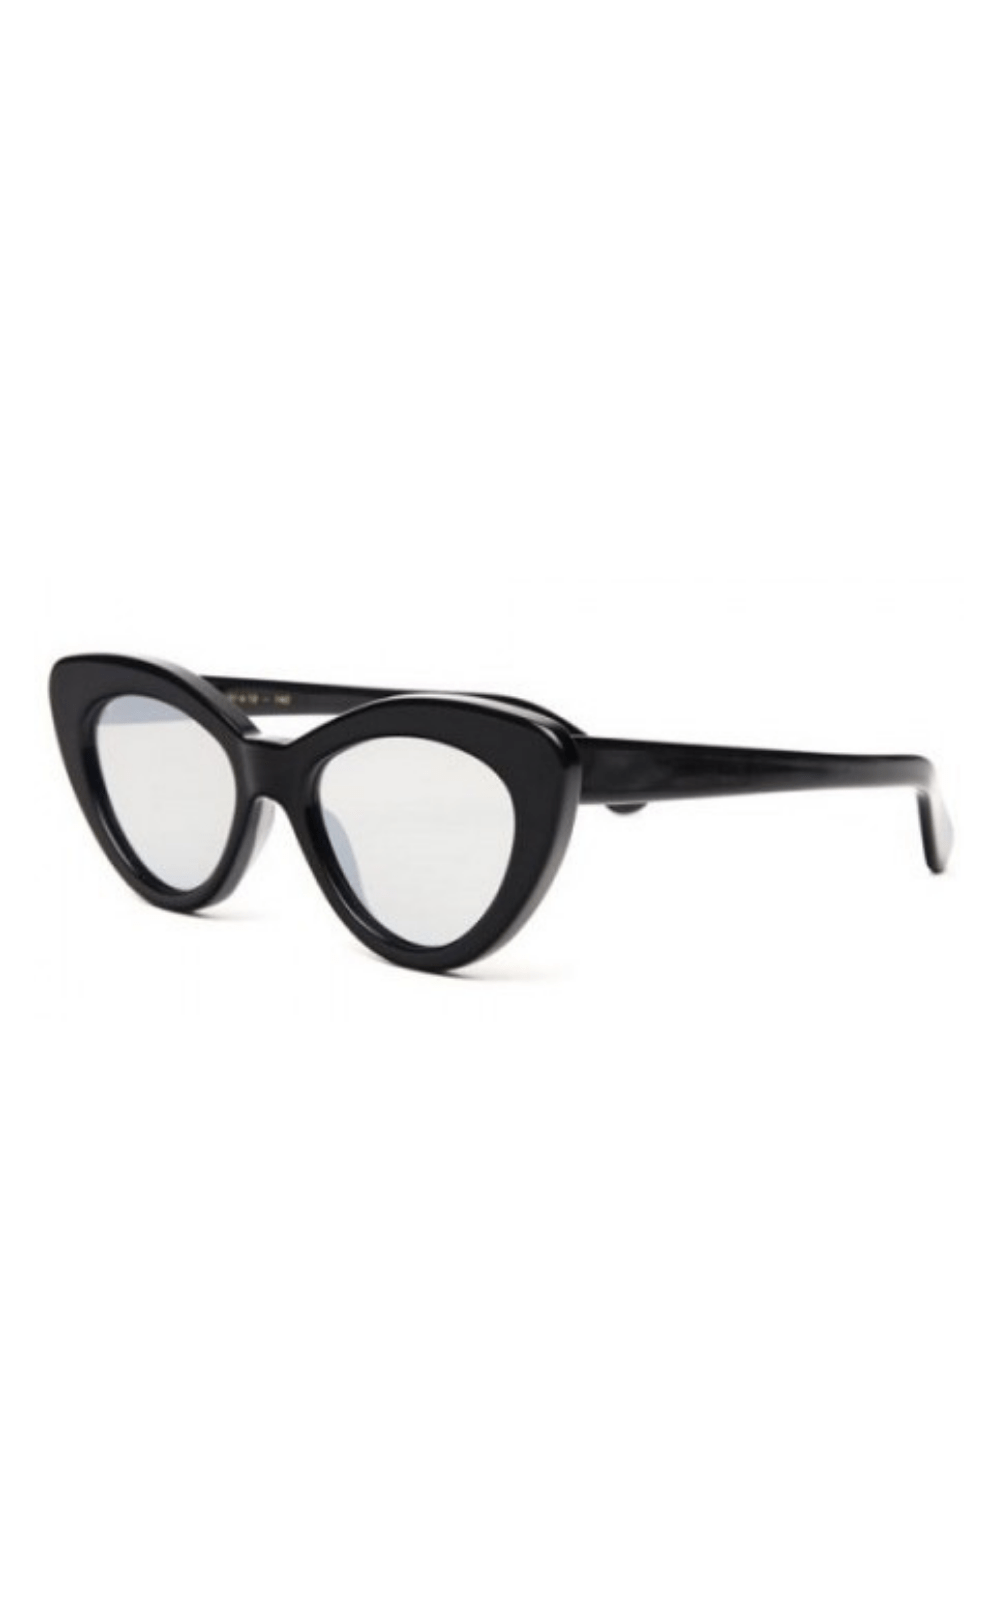 5b8797073 Óculos de Sol Illesteva Pamela Preto   Opte+